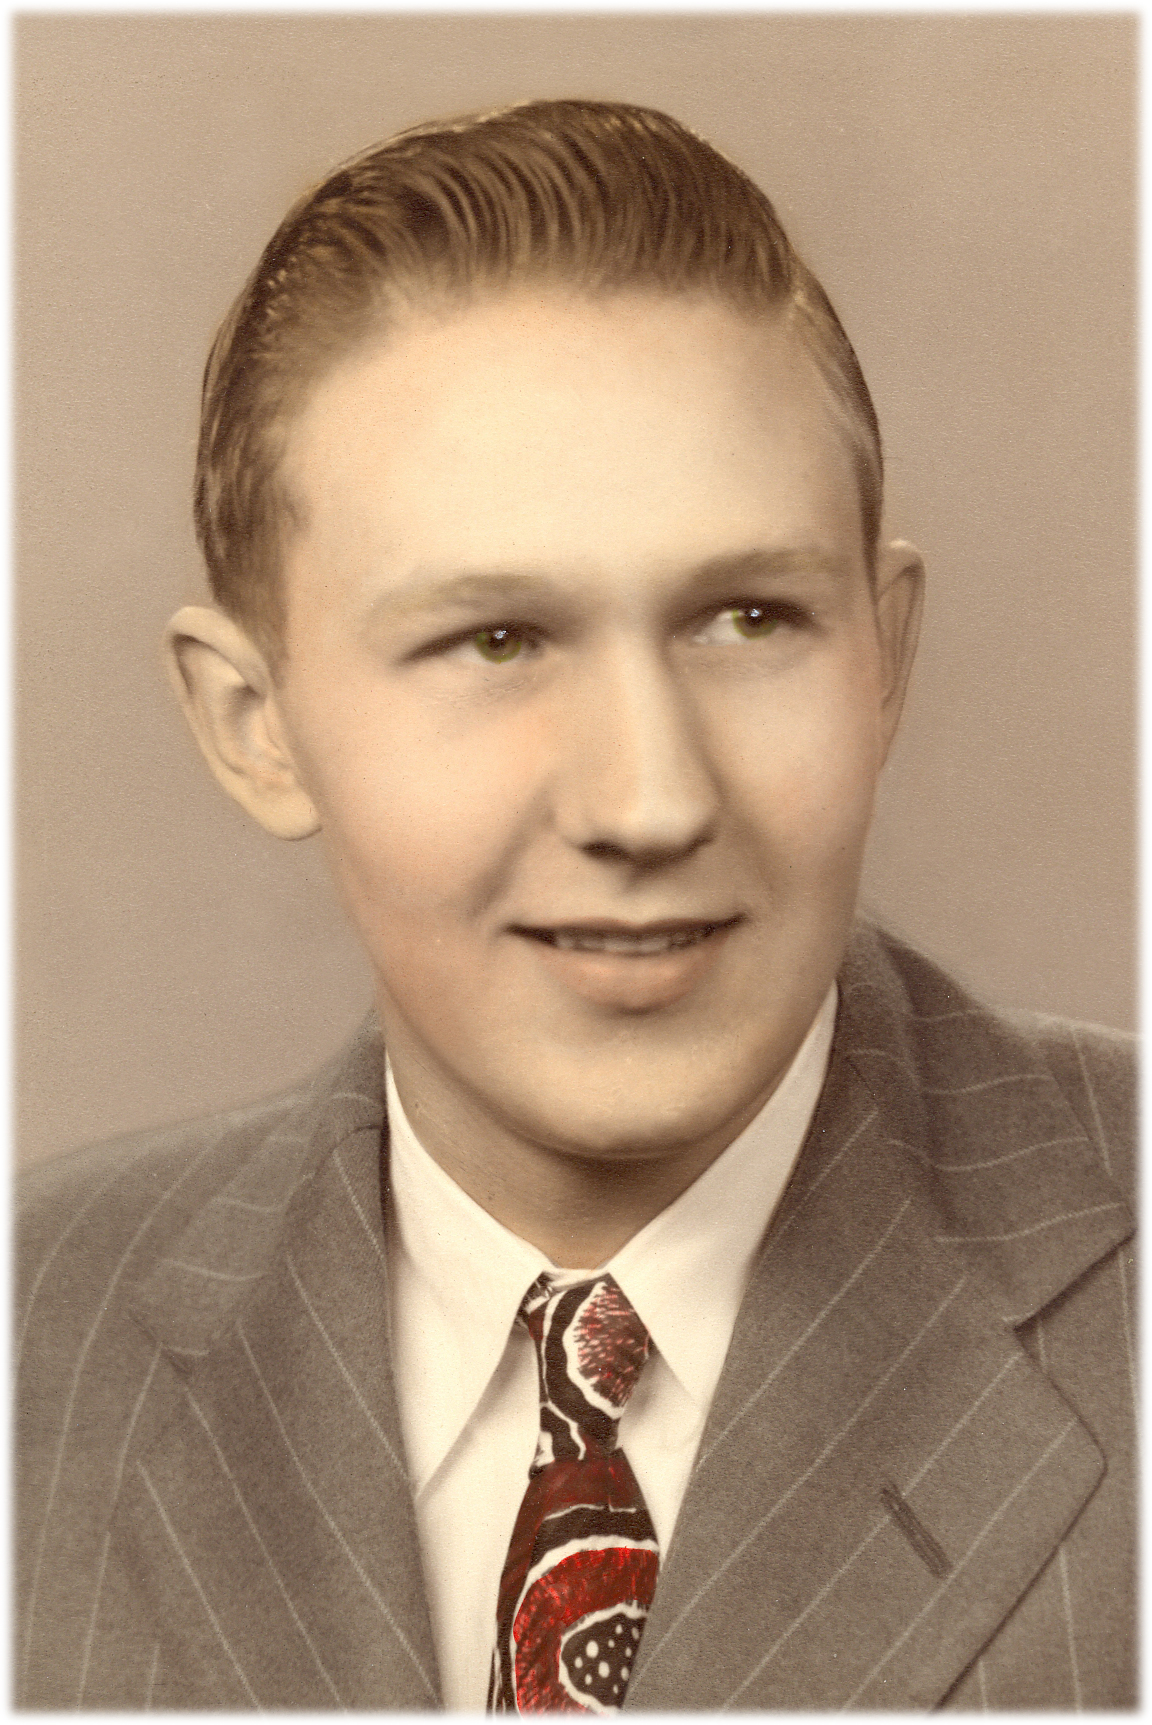 Paul R. Stuckey